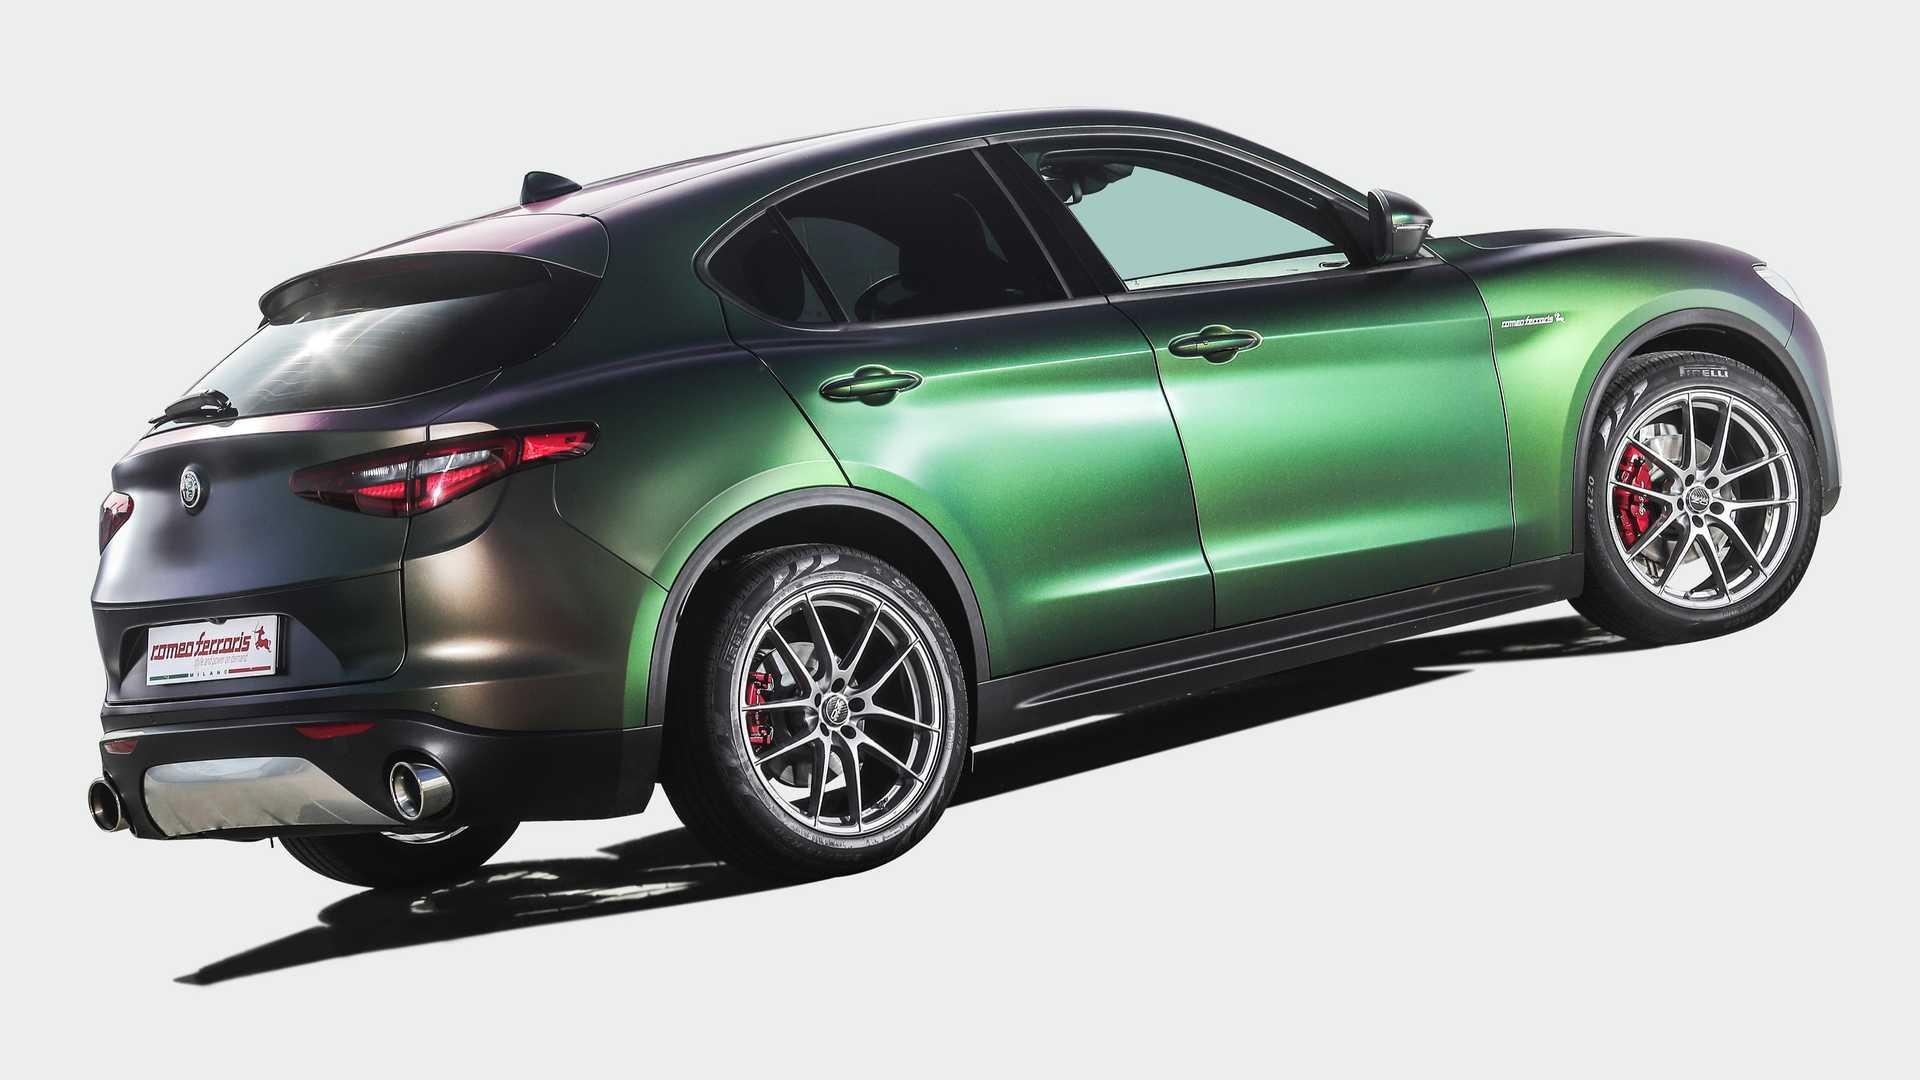 Alfa_Romeo_Stelvio_by_Romeo_Ferraris_0006